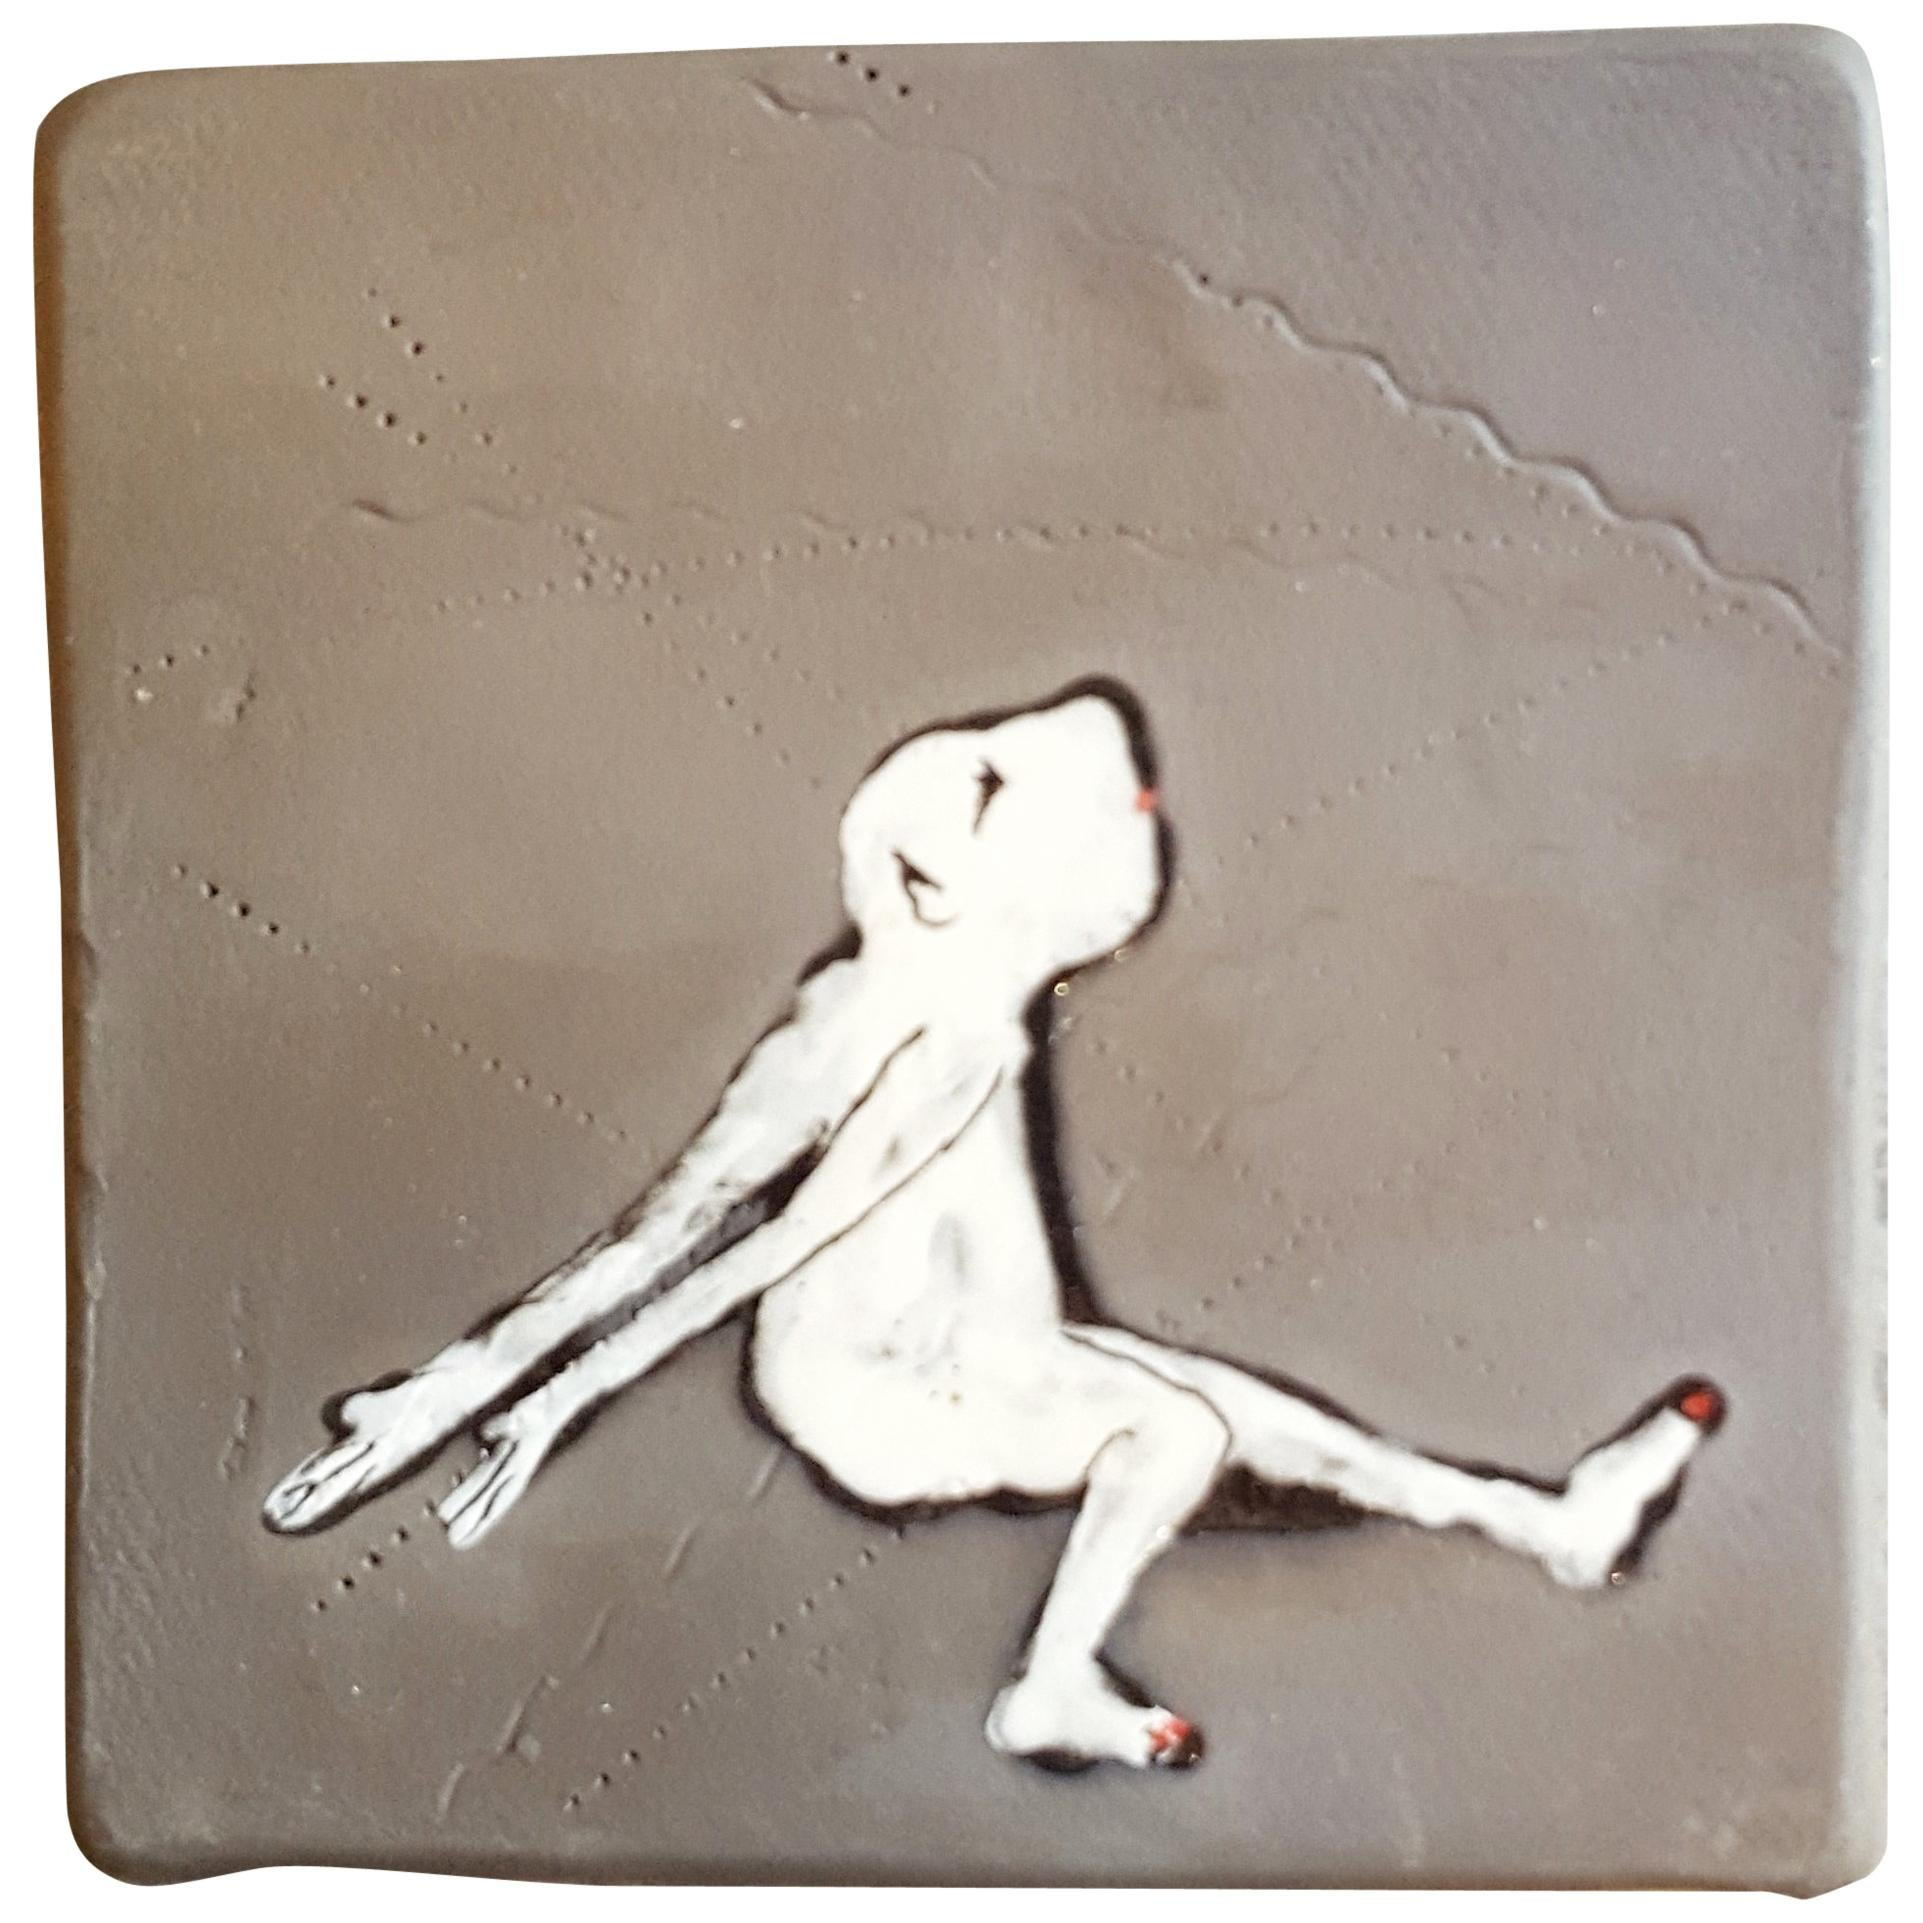 Unique French Artist's Ceramic Square Decorative Panels